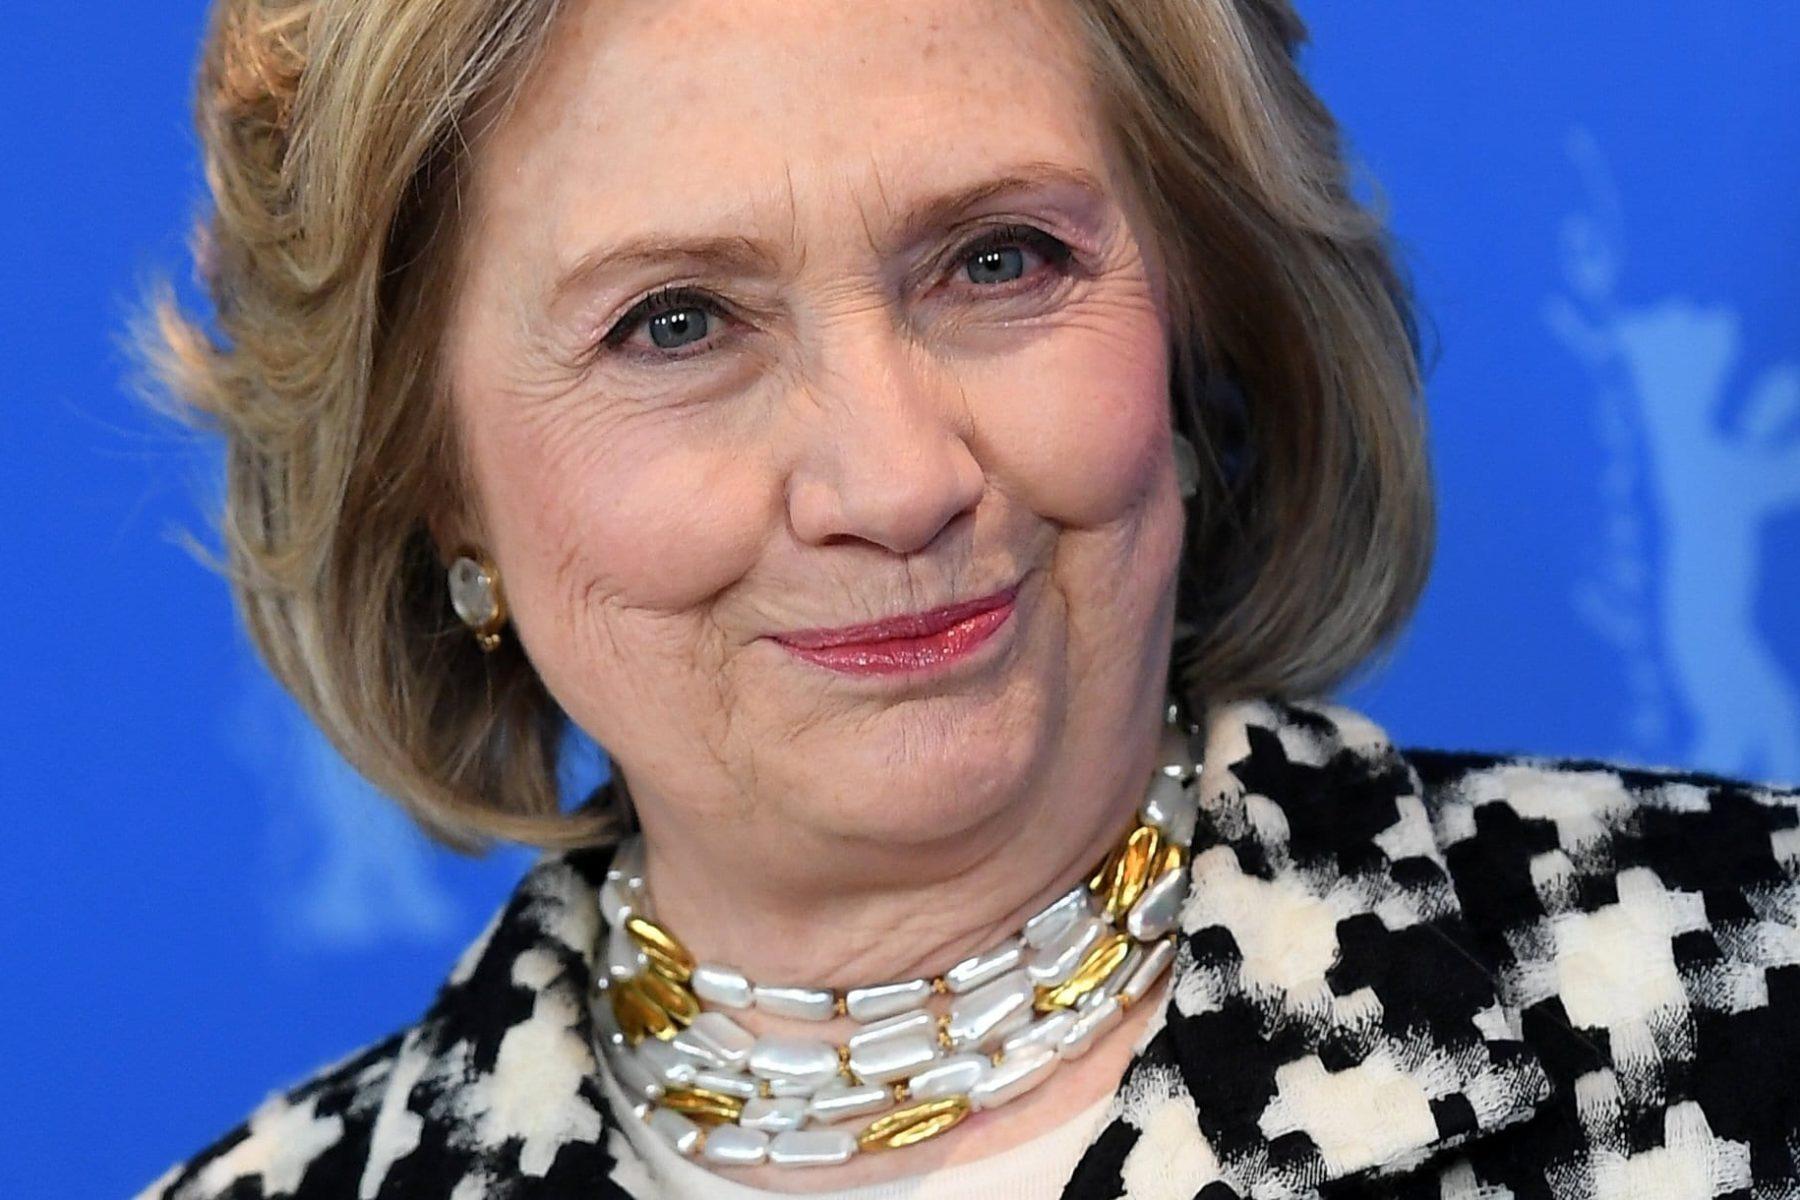 Hillary Clinton smiling.